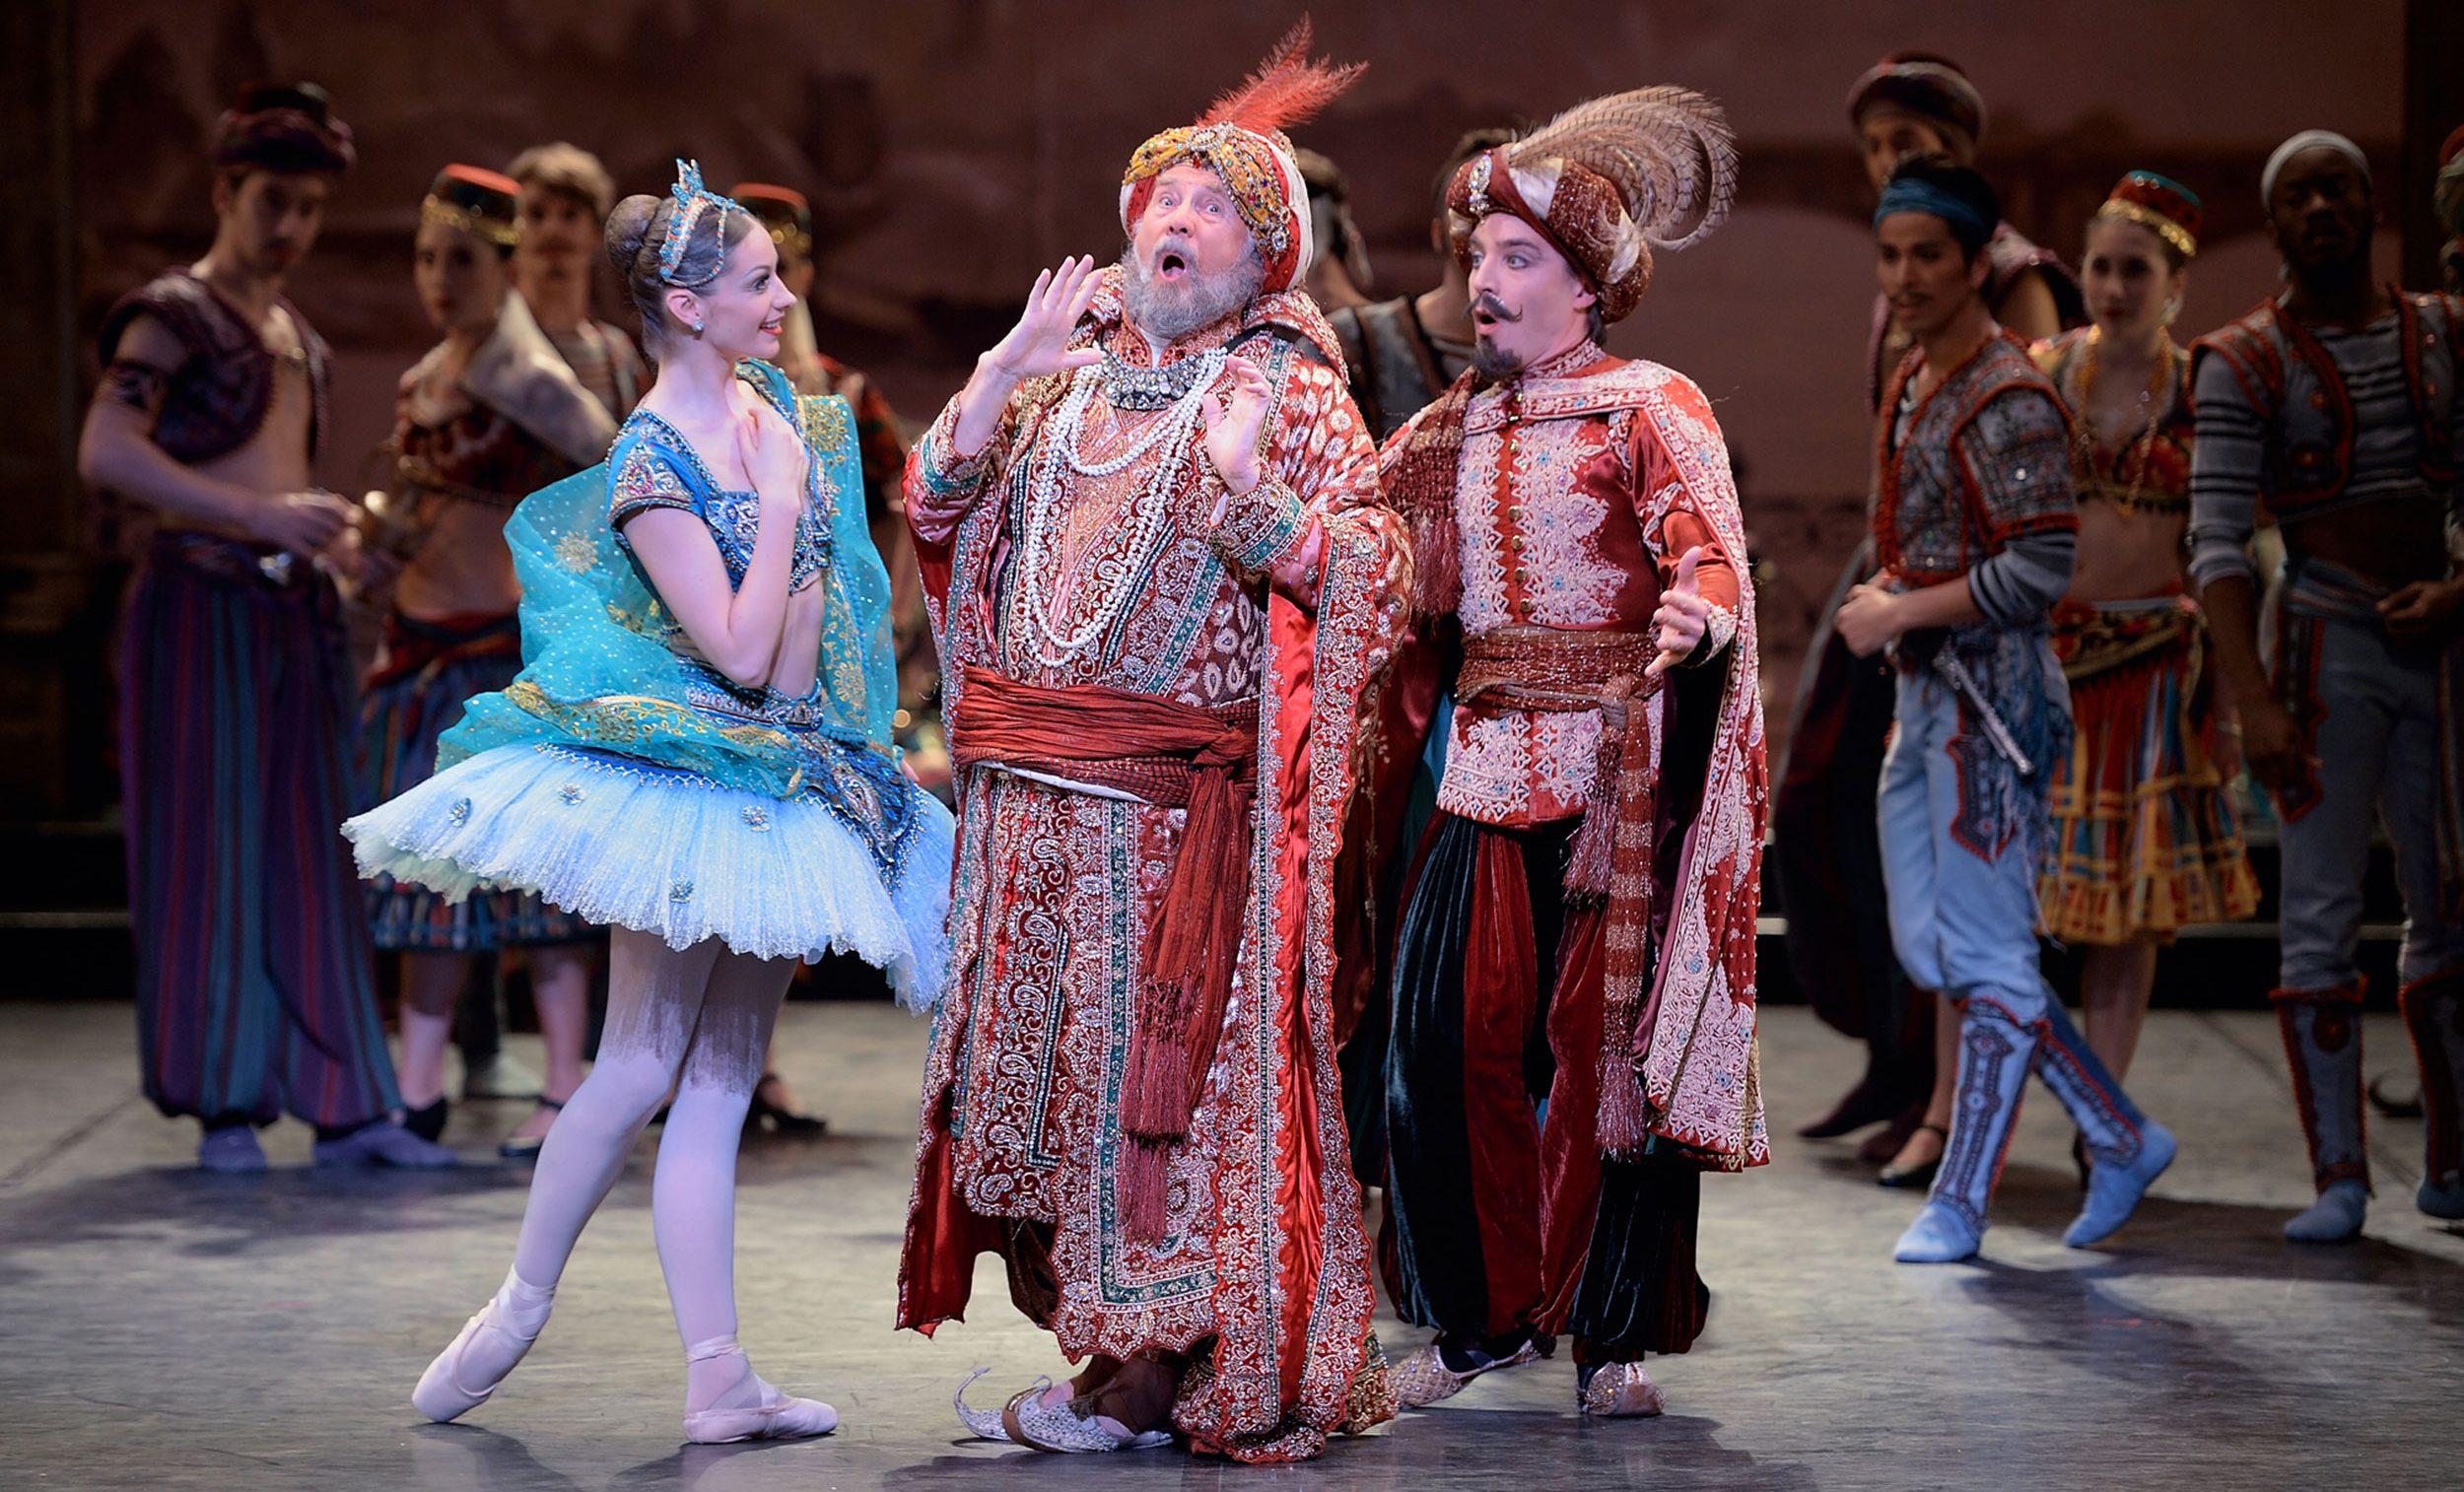 Laurretta Summerscales as Medora and Michael Coleman as Pasha in Le Corsaire © Laurent Liotardo